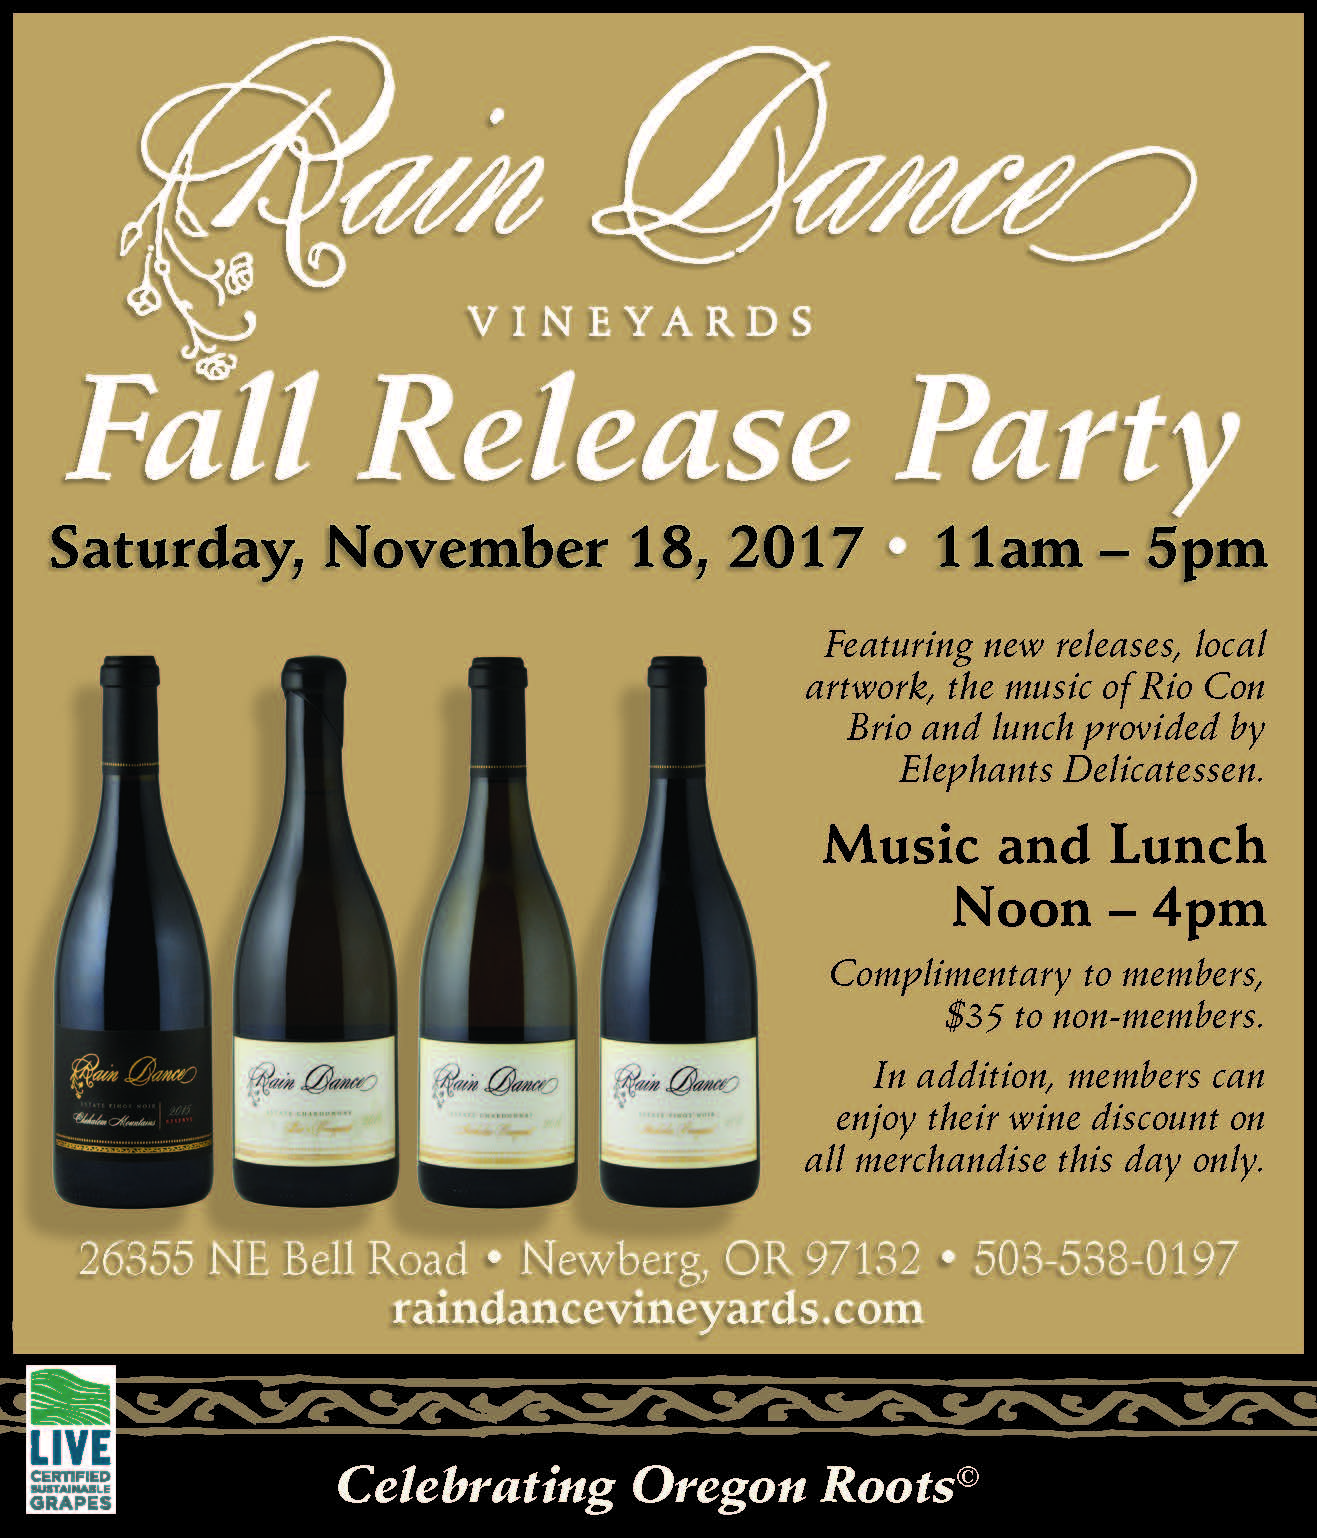 Rain Dance Vineyard - Oregon Wine Press 4.375x5.125 ad (1).jpg